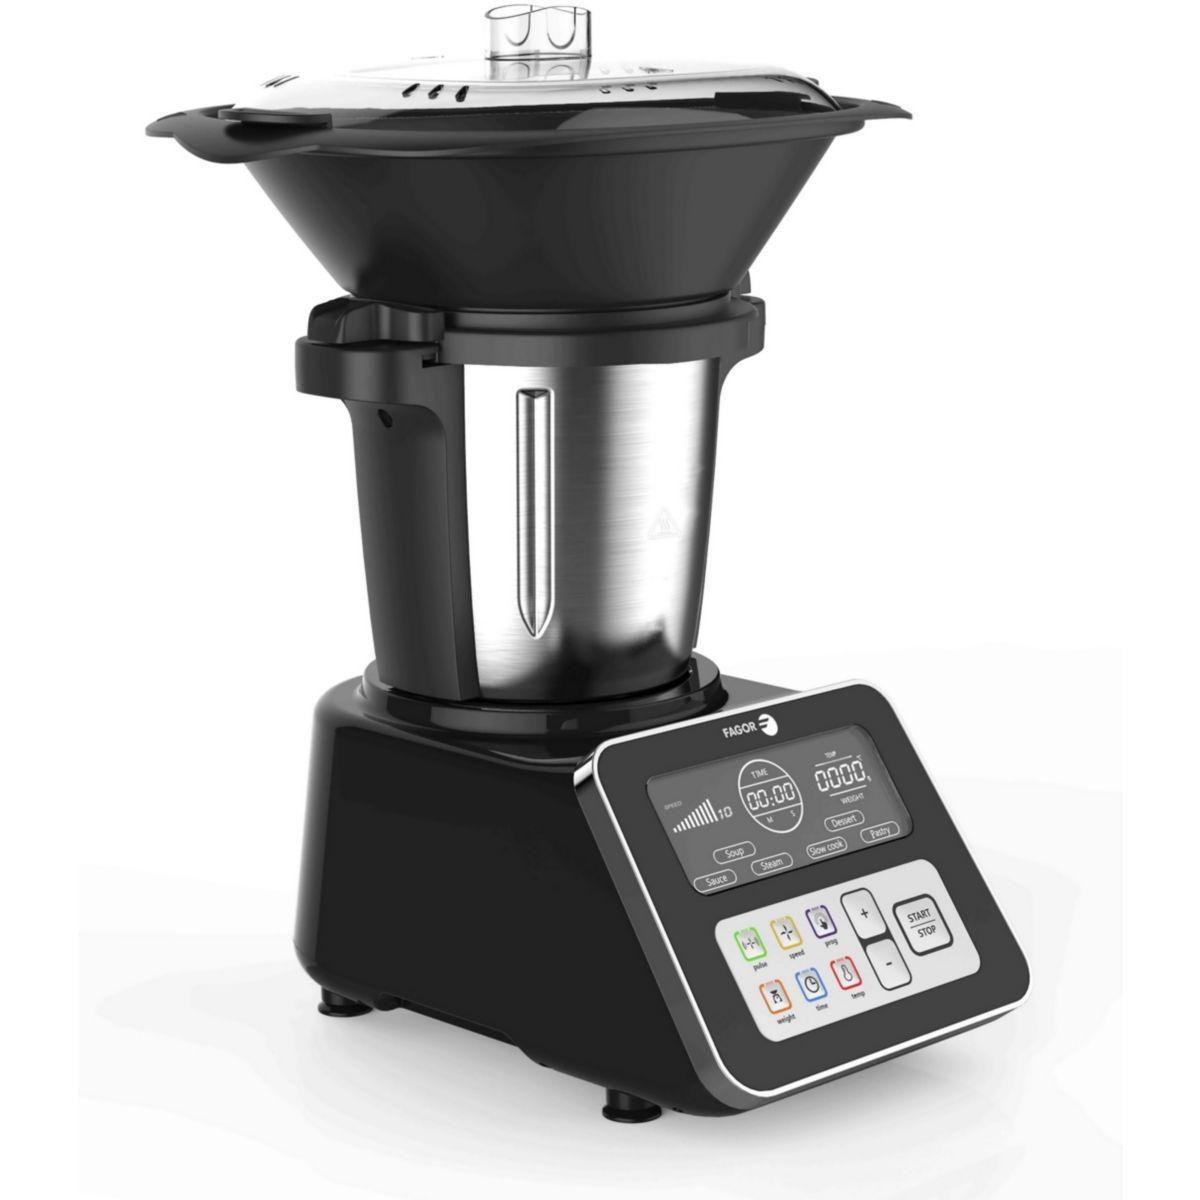 Robot cuiseur FAGOR Grand Chef PLUS FG1500